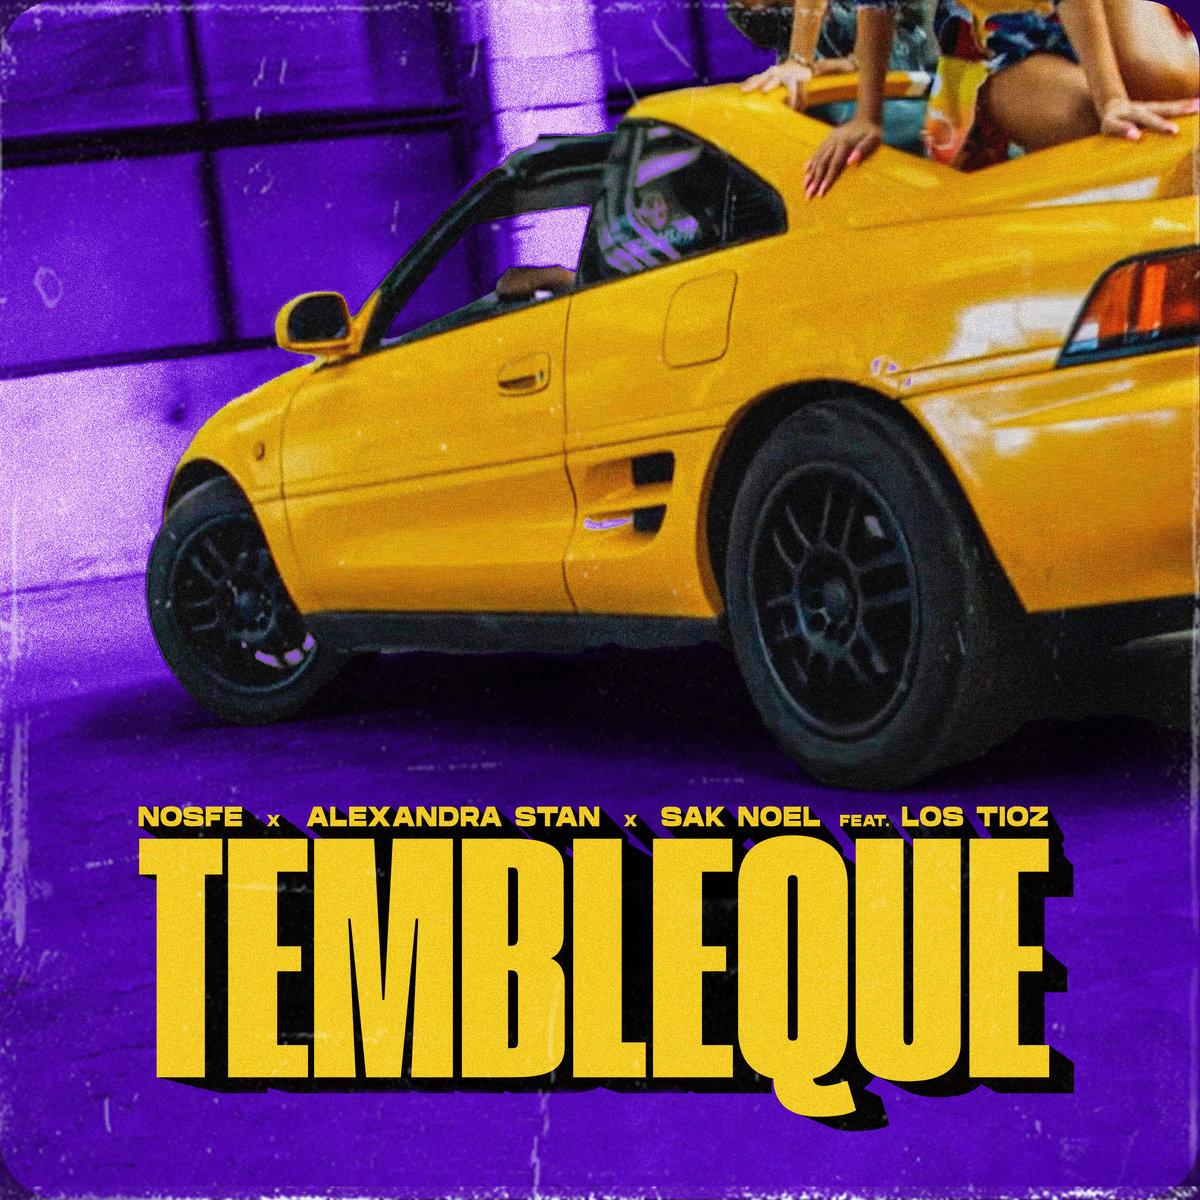 NOSFE x Alexandra Stan x Sak Noel feat. Los Tioz - Tembleque - Remixes